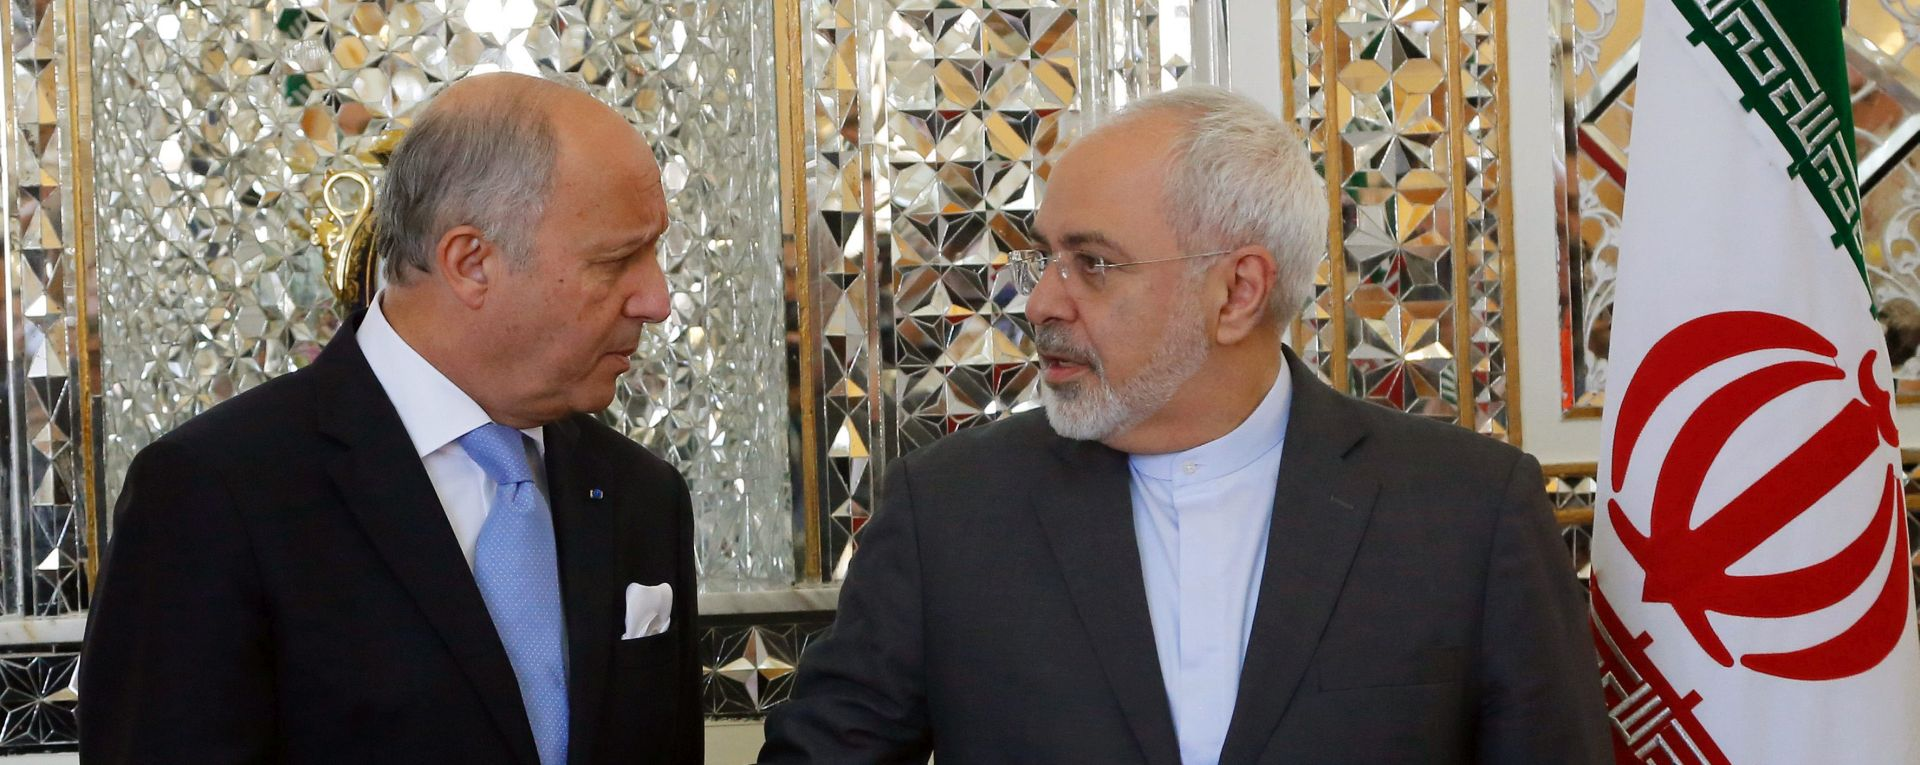 IRANSKO FRANCUSKA POMIRBA: Sastali se Fabiens i Rohani